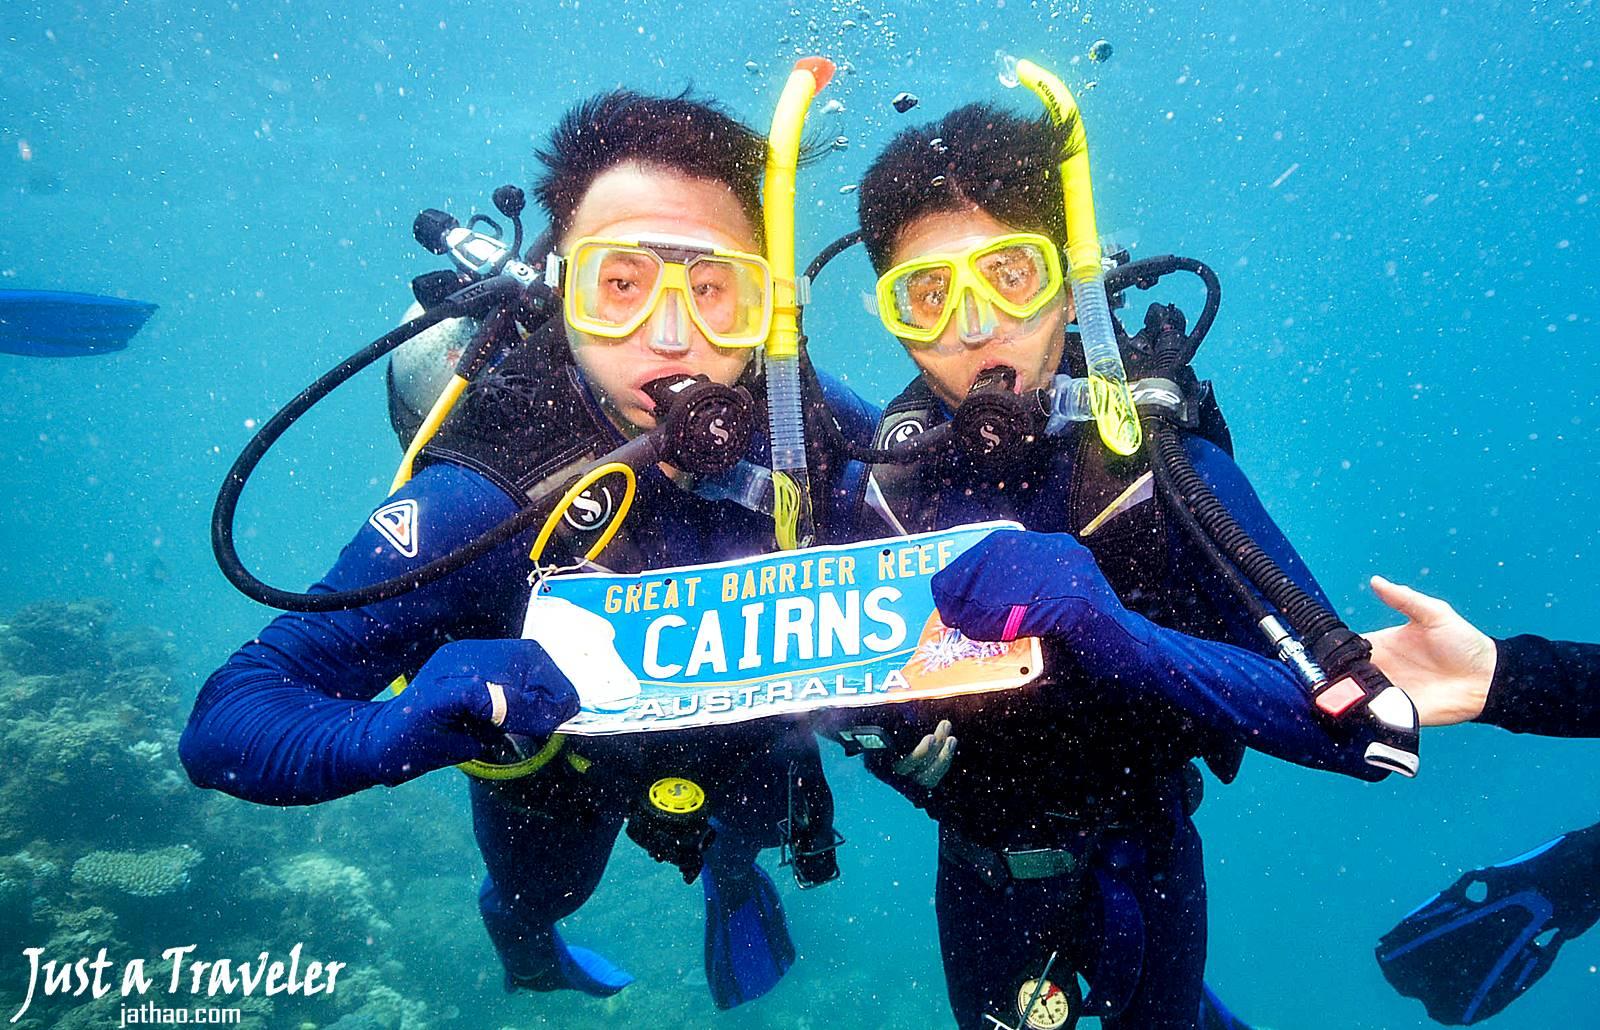 凱恩斯-大堡礁-外堡礁-推薦-公司-行程-旅遊-潛水-浮潛-自由行-澳洲-Cairns-Outer-Great-Barrier-Reef-Snorkel-Diving-Travel-Australia